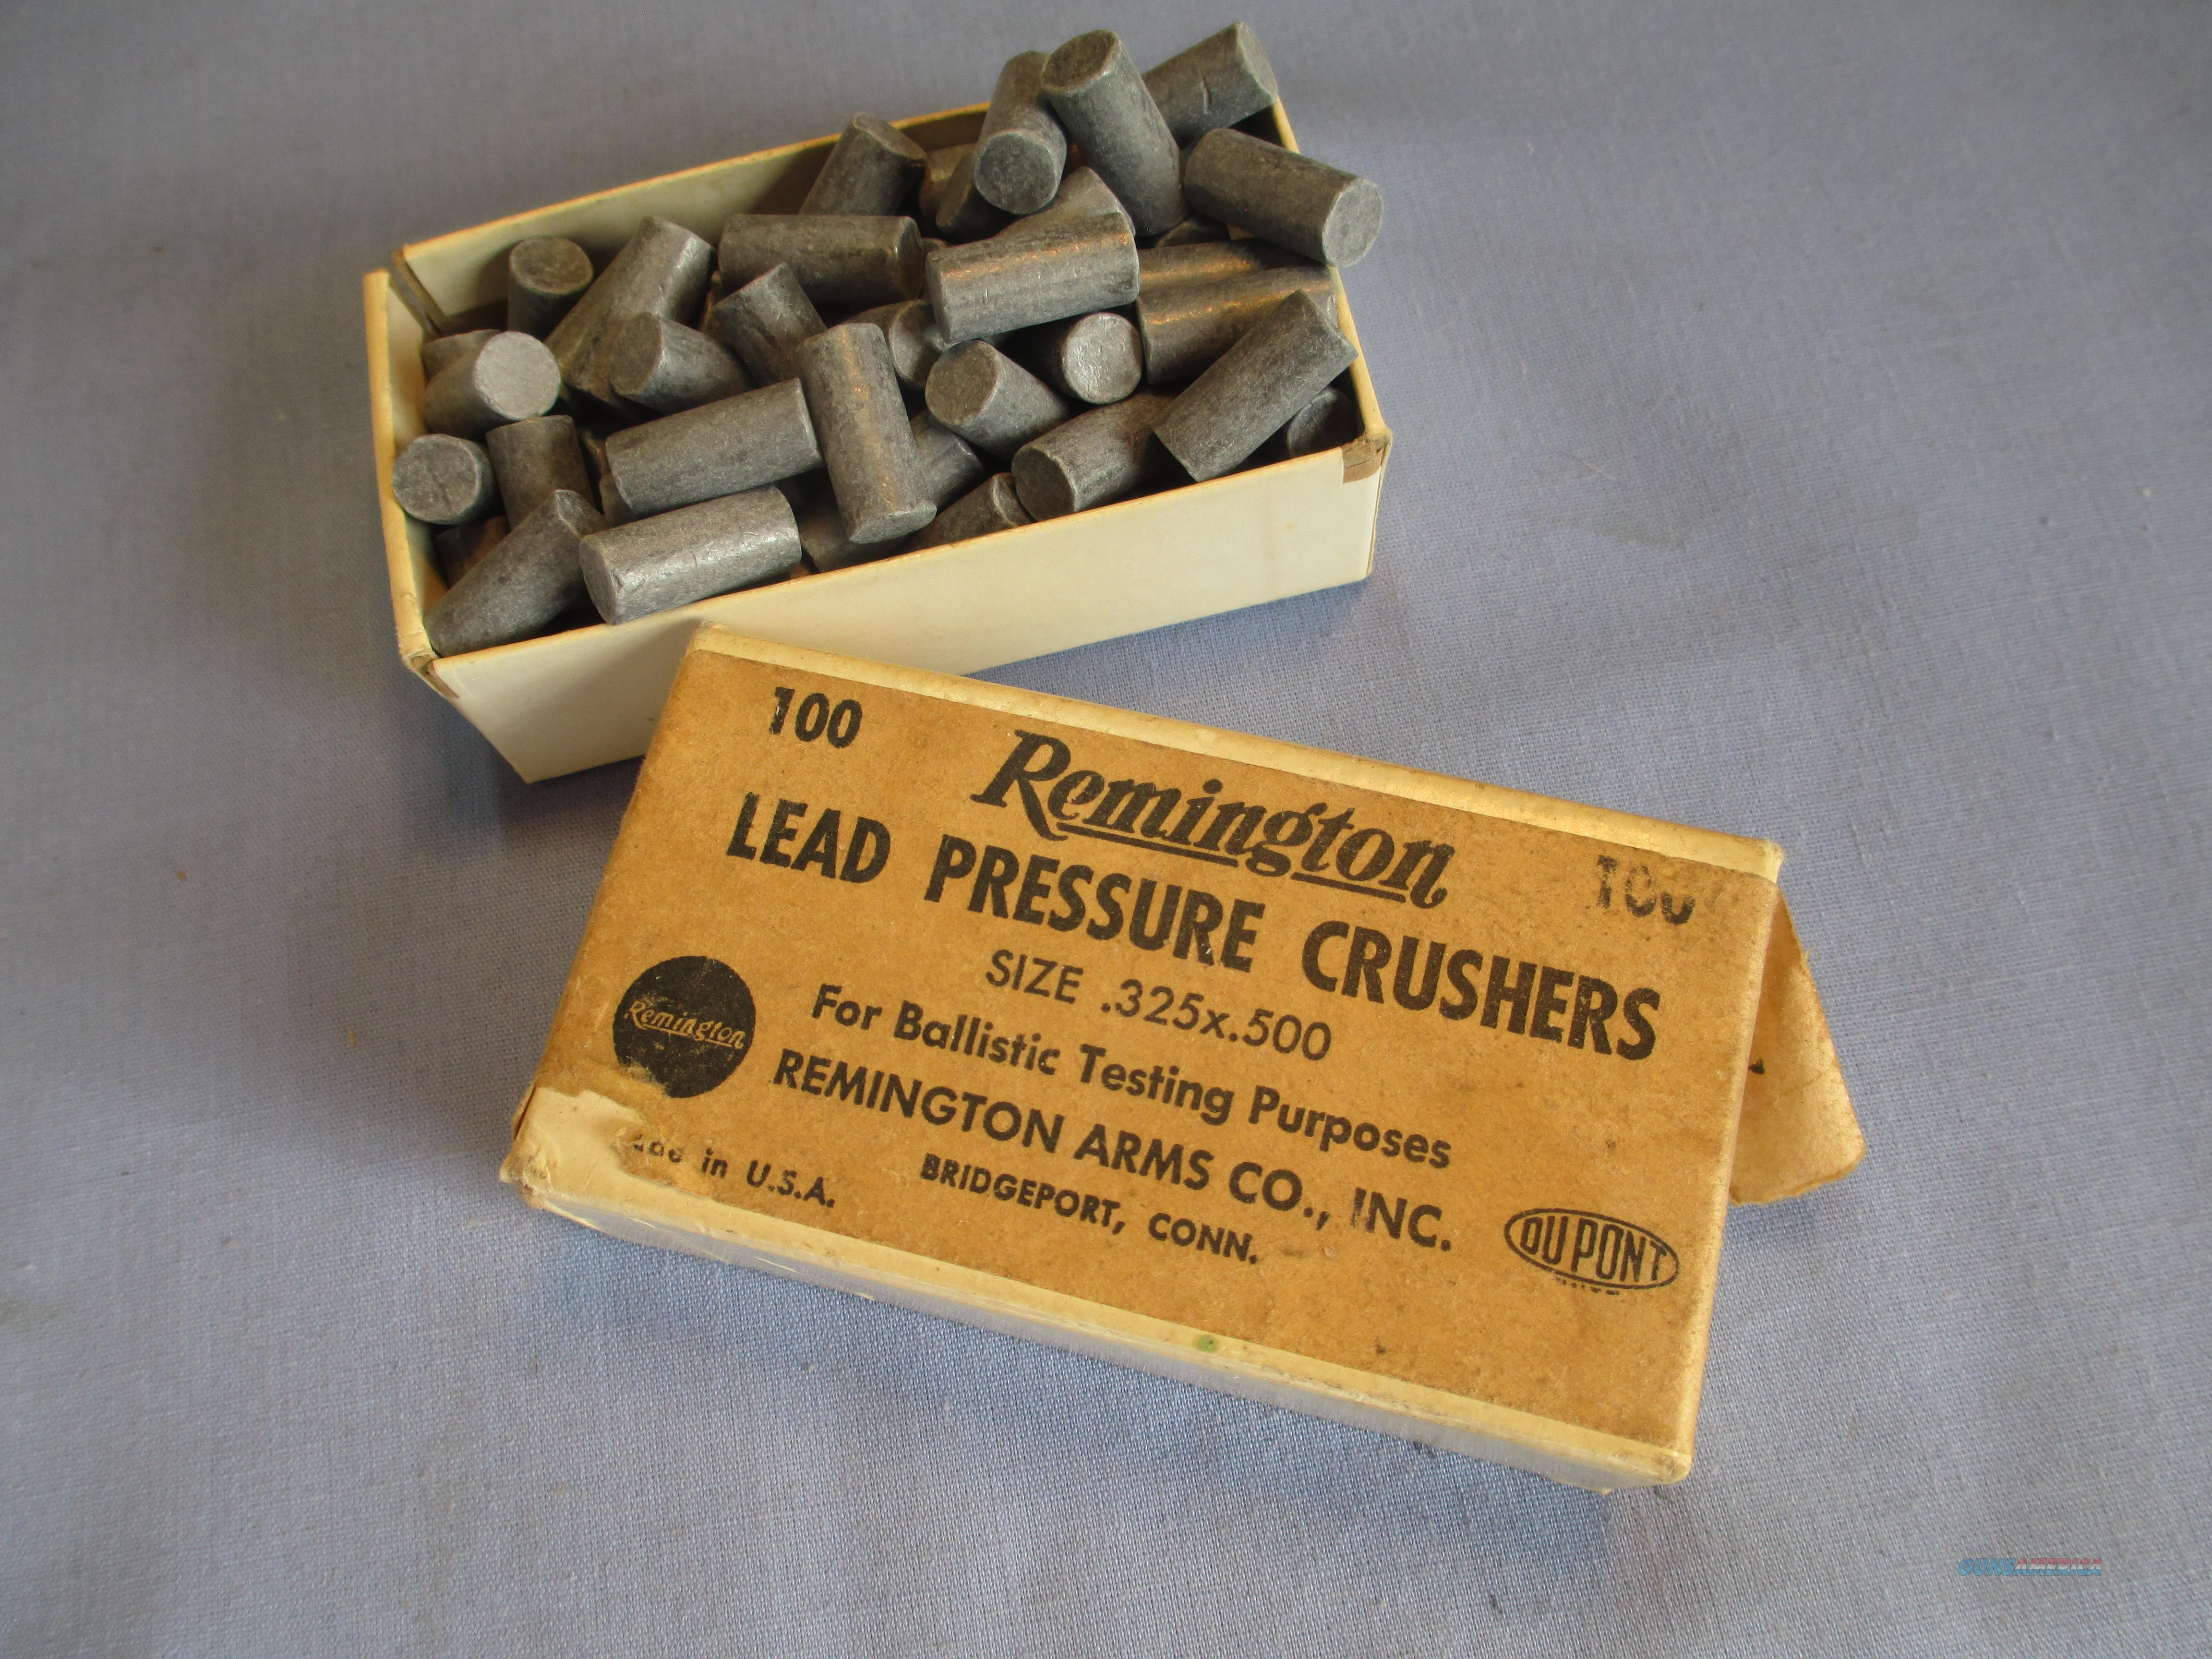 REMINGTON LEAD PRESSURE CRUSHERS   Non-Guns > Bullet Making Supplies